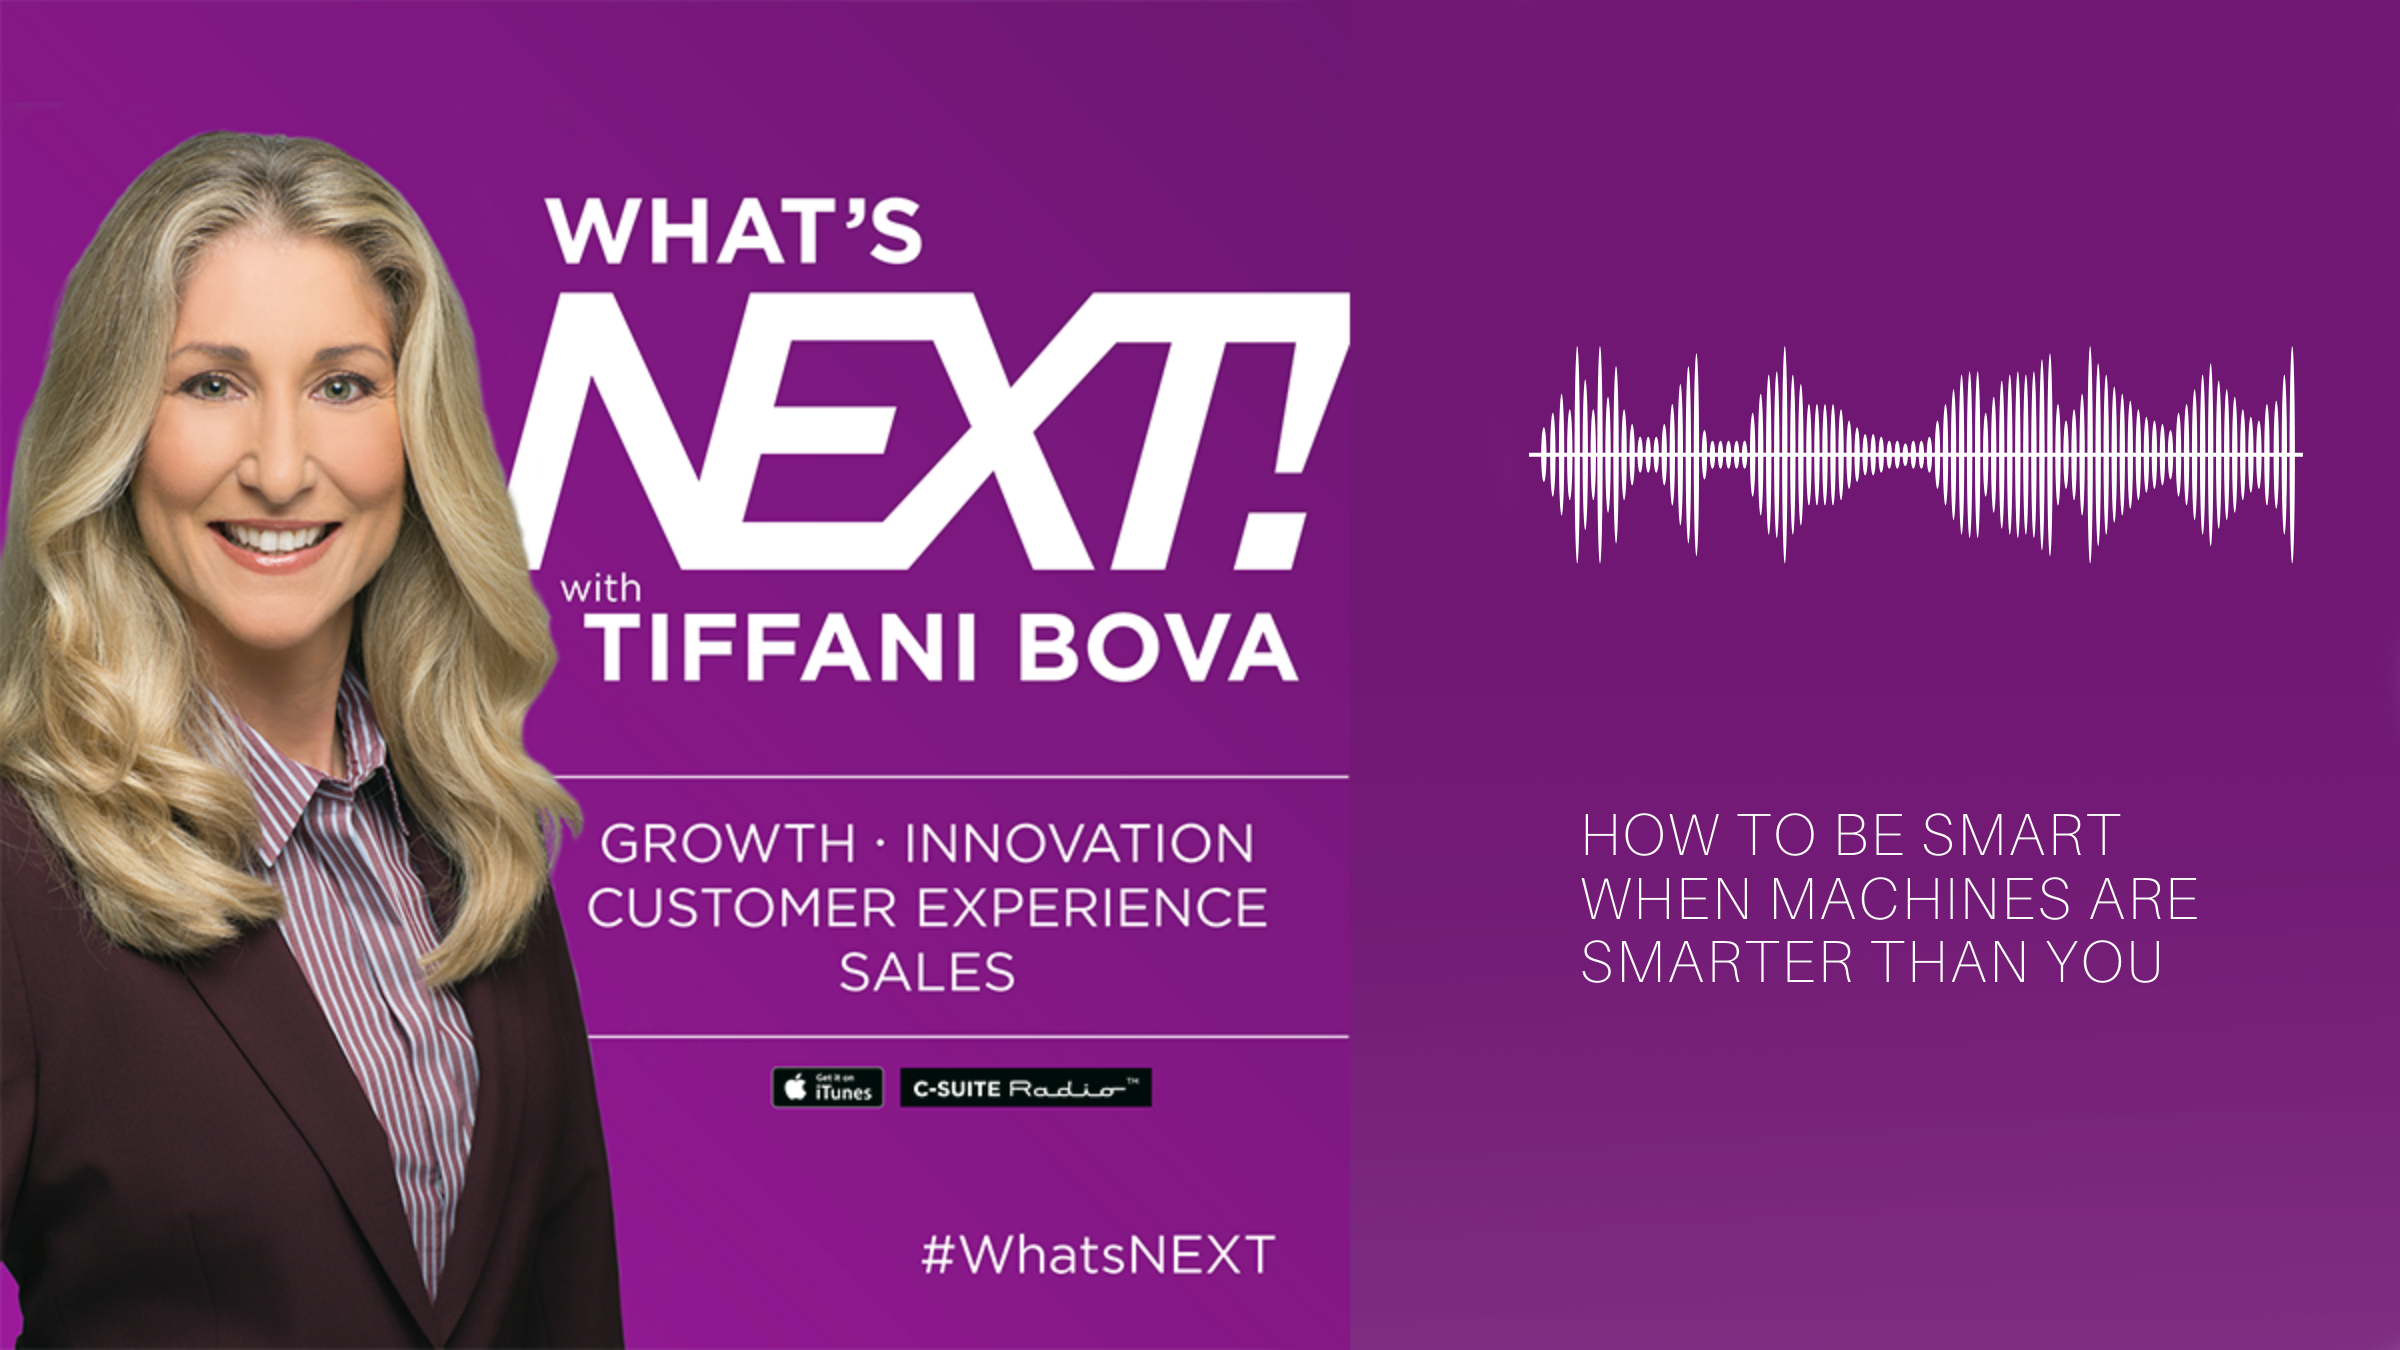 Whats Next! with Tiffani Bova Podcast